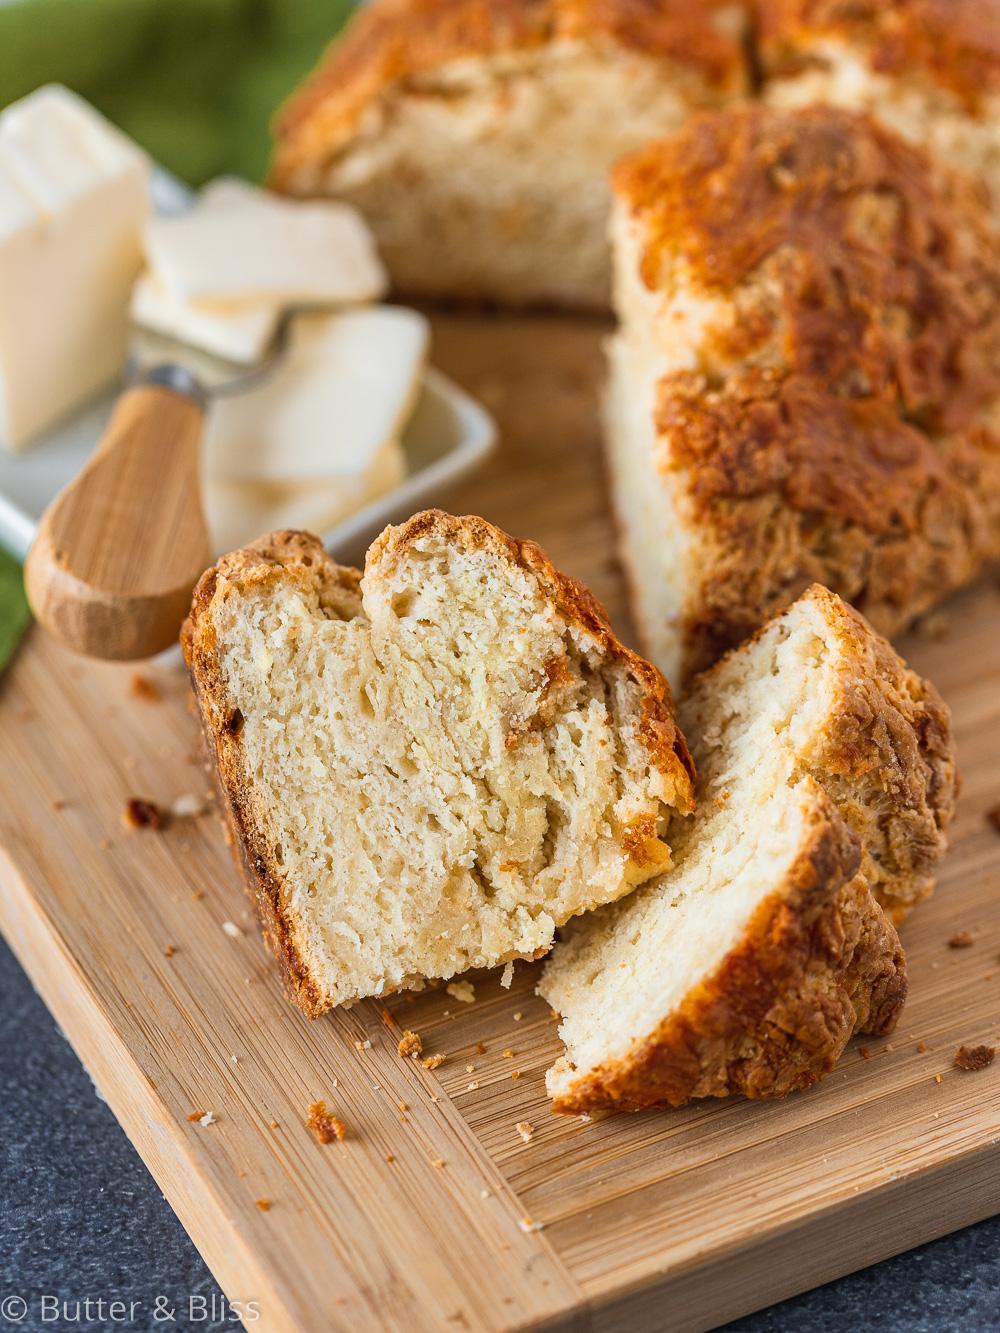 Piece of irish soda bread and butter